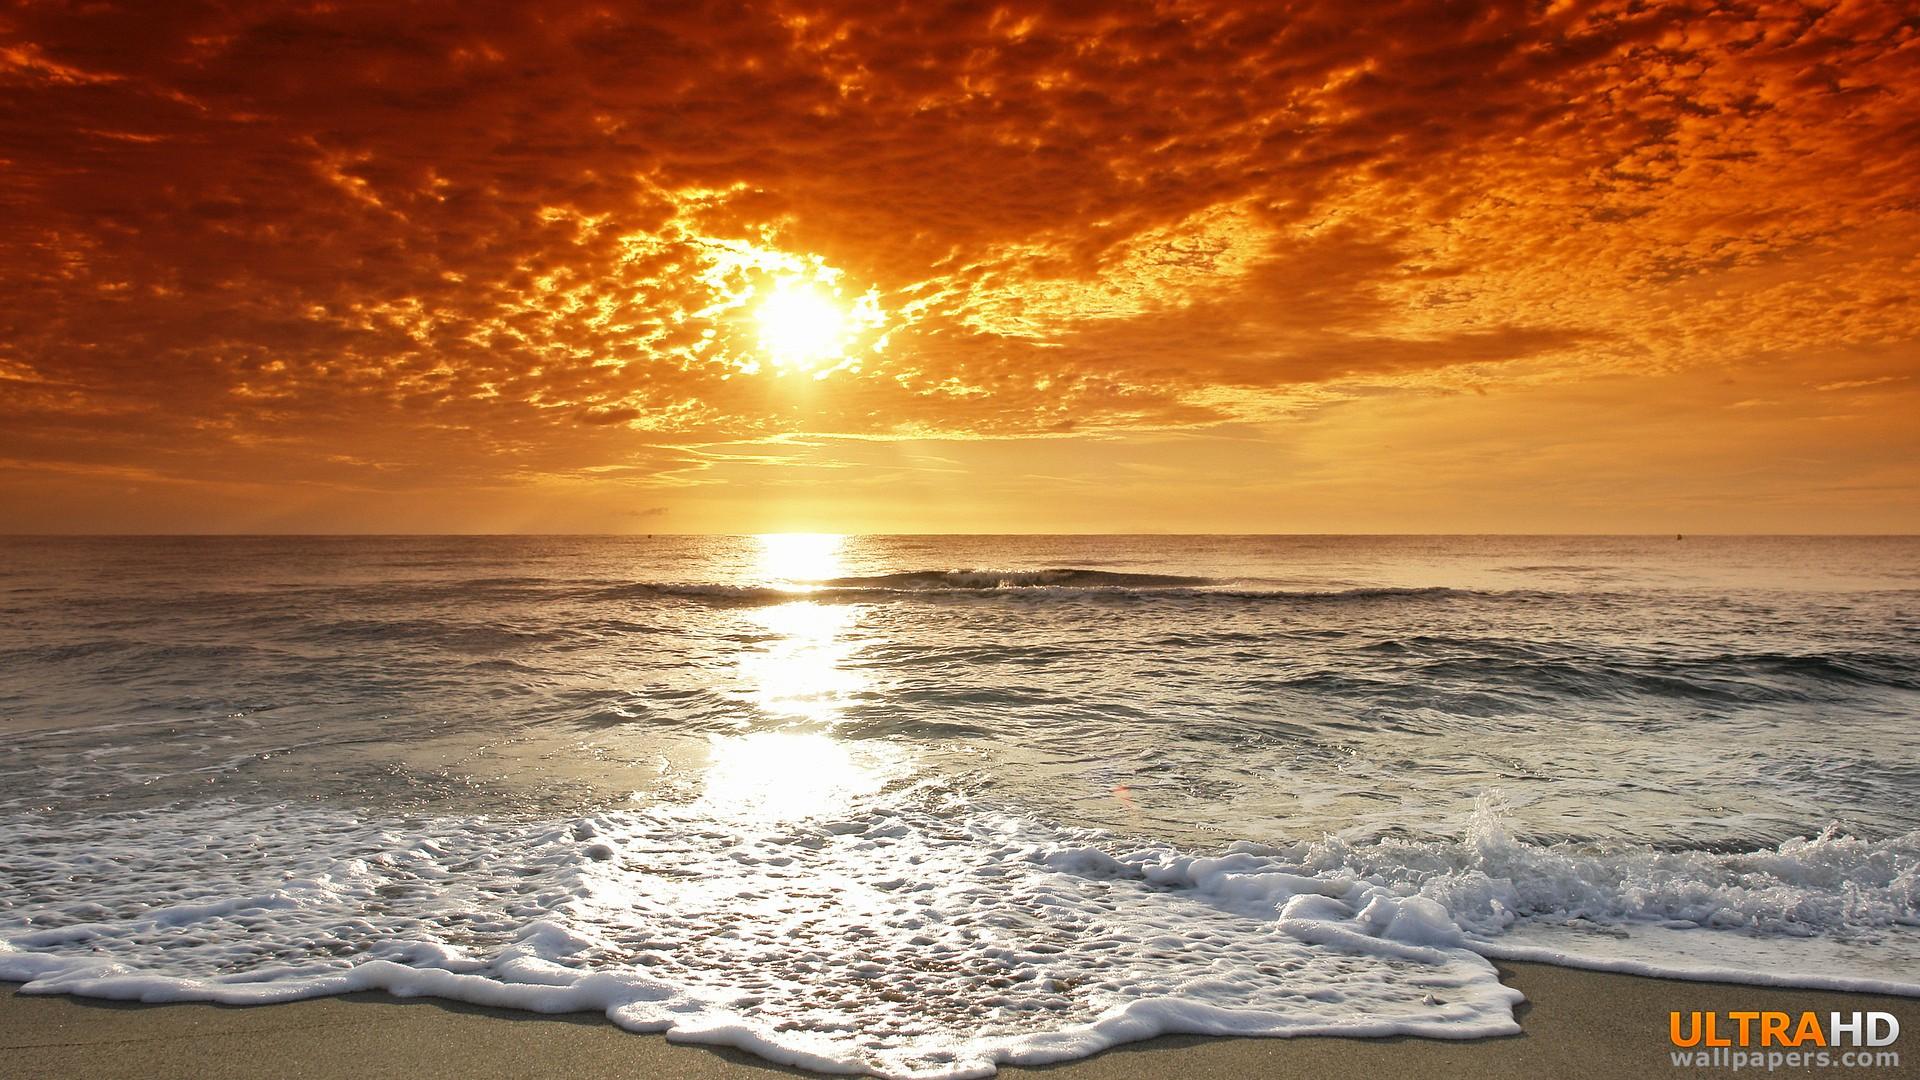 Sunset At Sea HD wallpapers